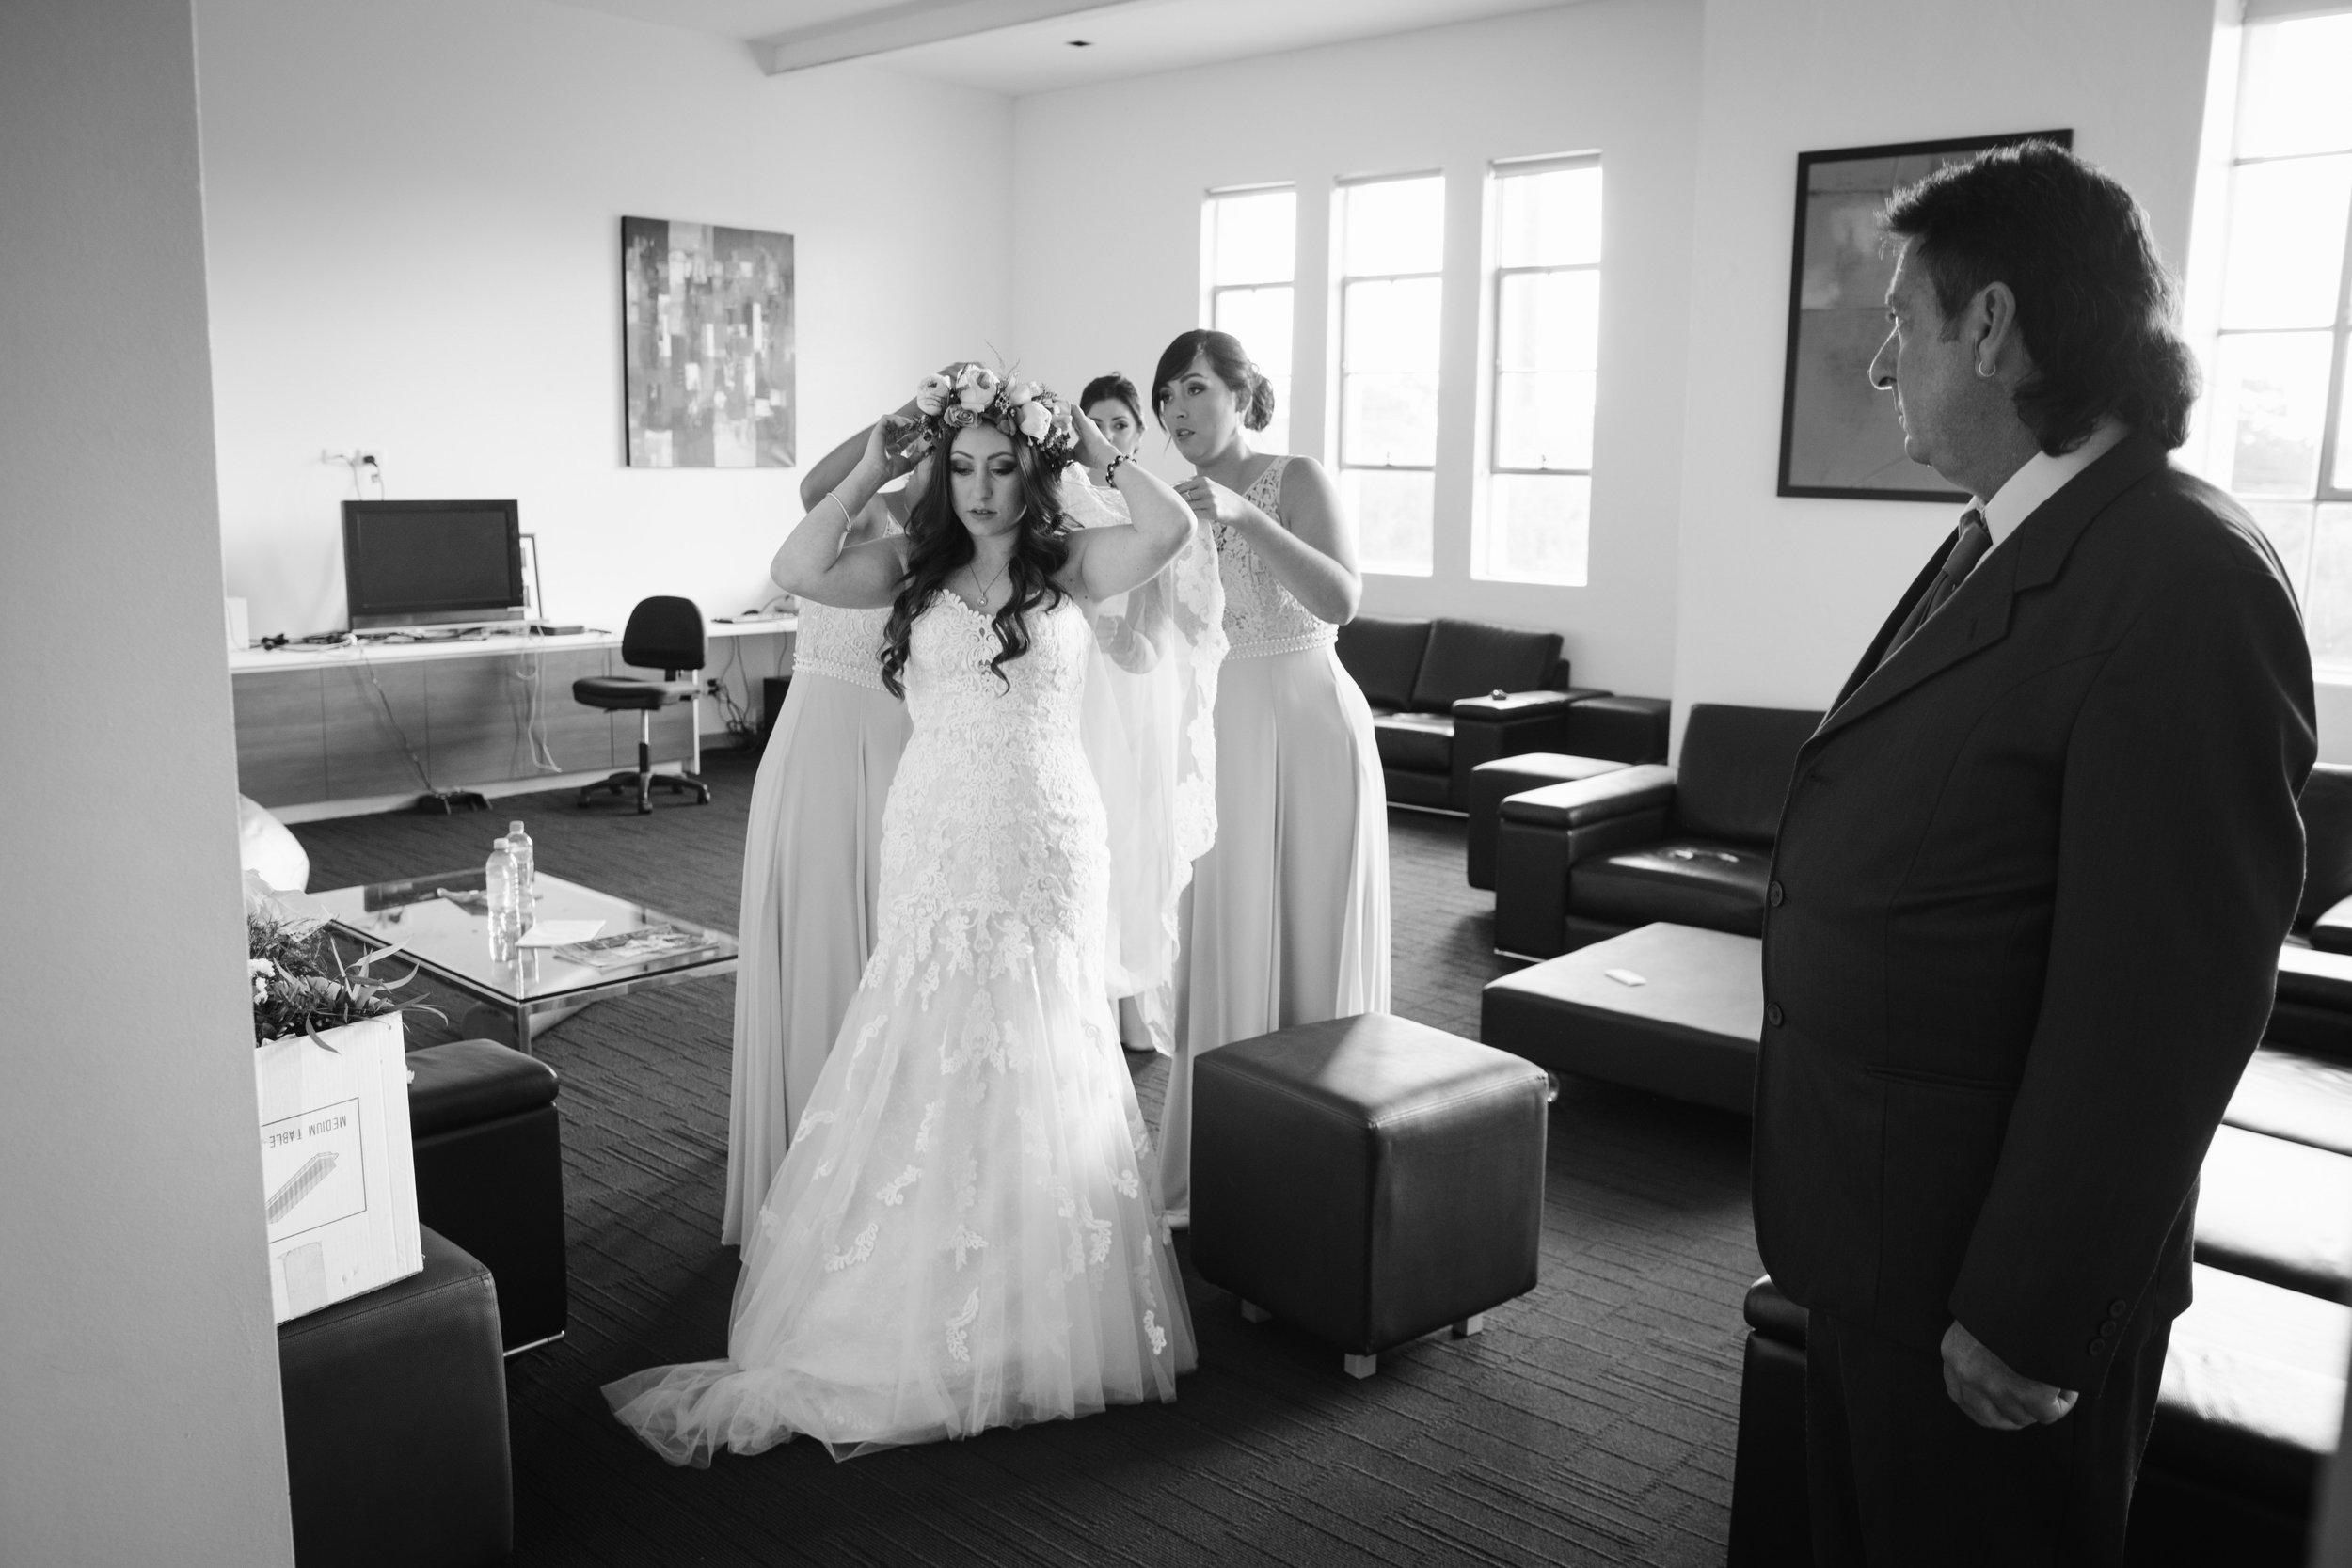 WA Ballet Centre Swan Valley Oakover Grounds Perth Wheatbelt Avon Valley Wedding Photographer (14).jpg